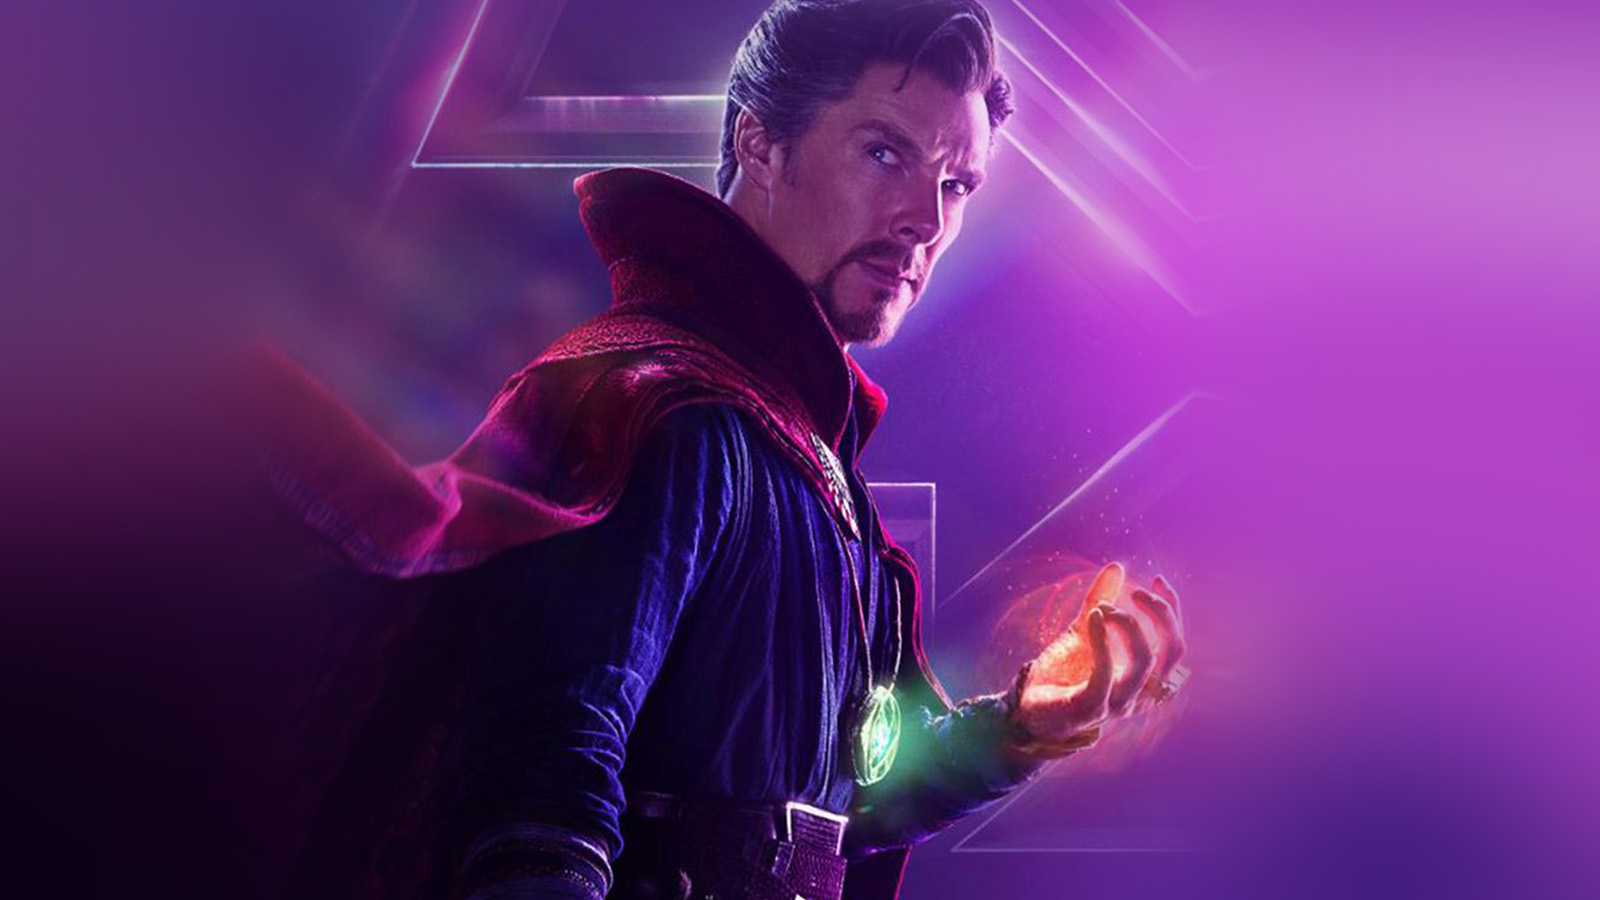 Doctor Strange Marvel Movie Wallpapers Widescreen Cinema: Wallpaper For Desktop, Laptop